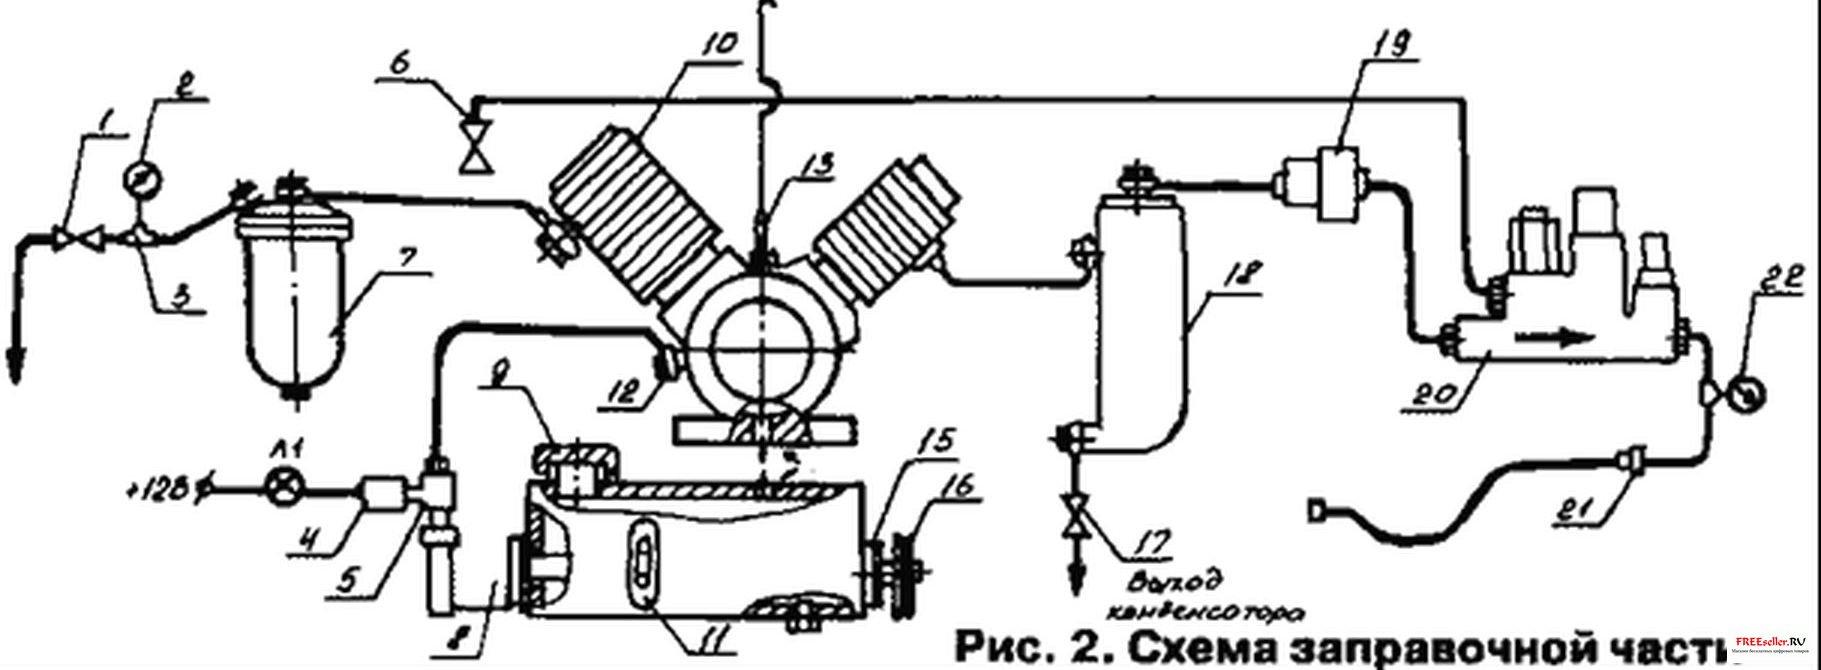 Схема компресора своими руками фото 400